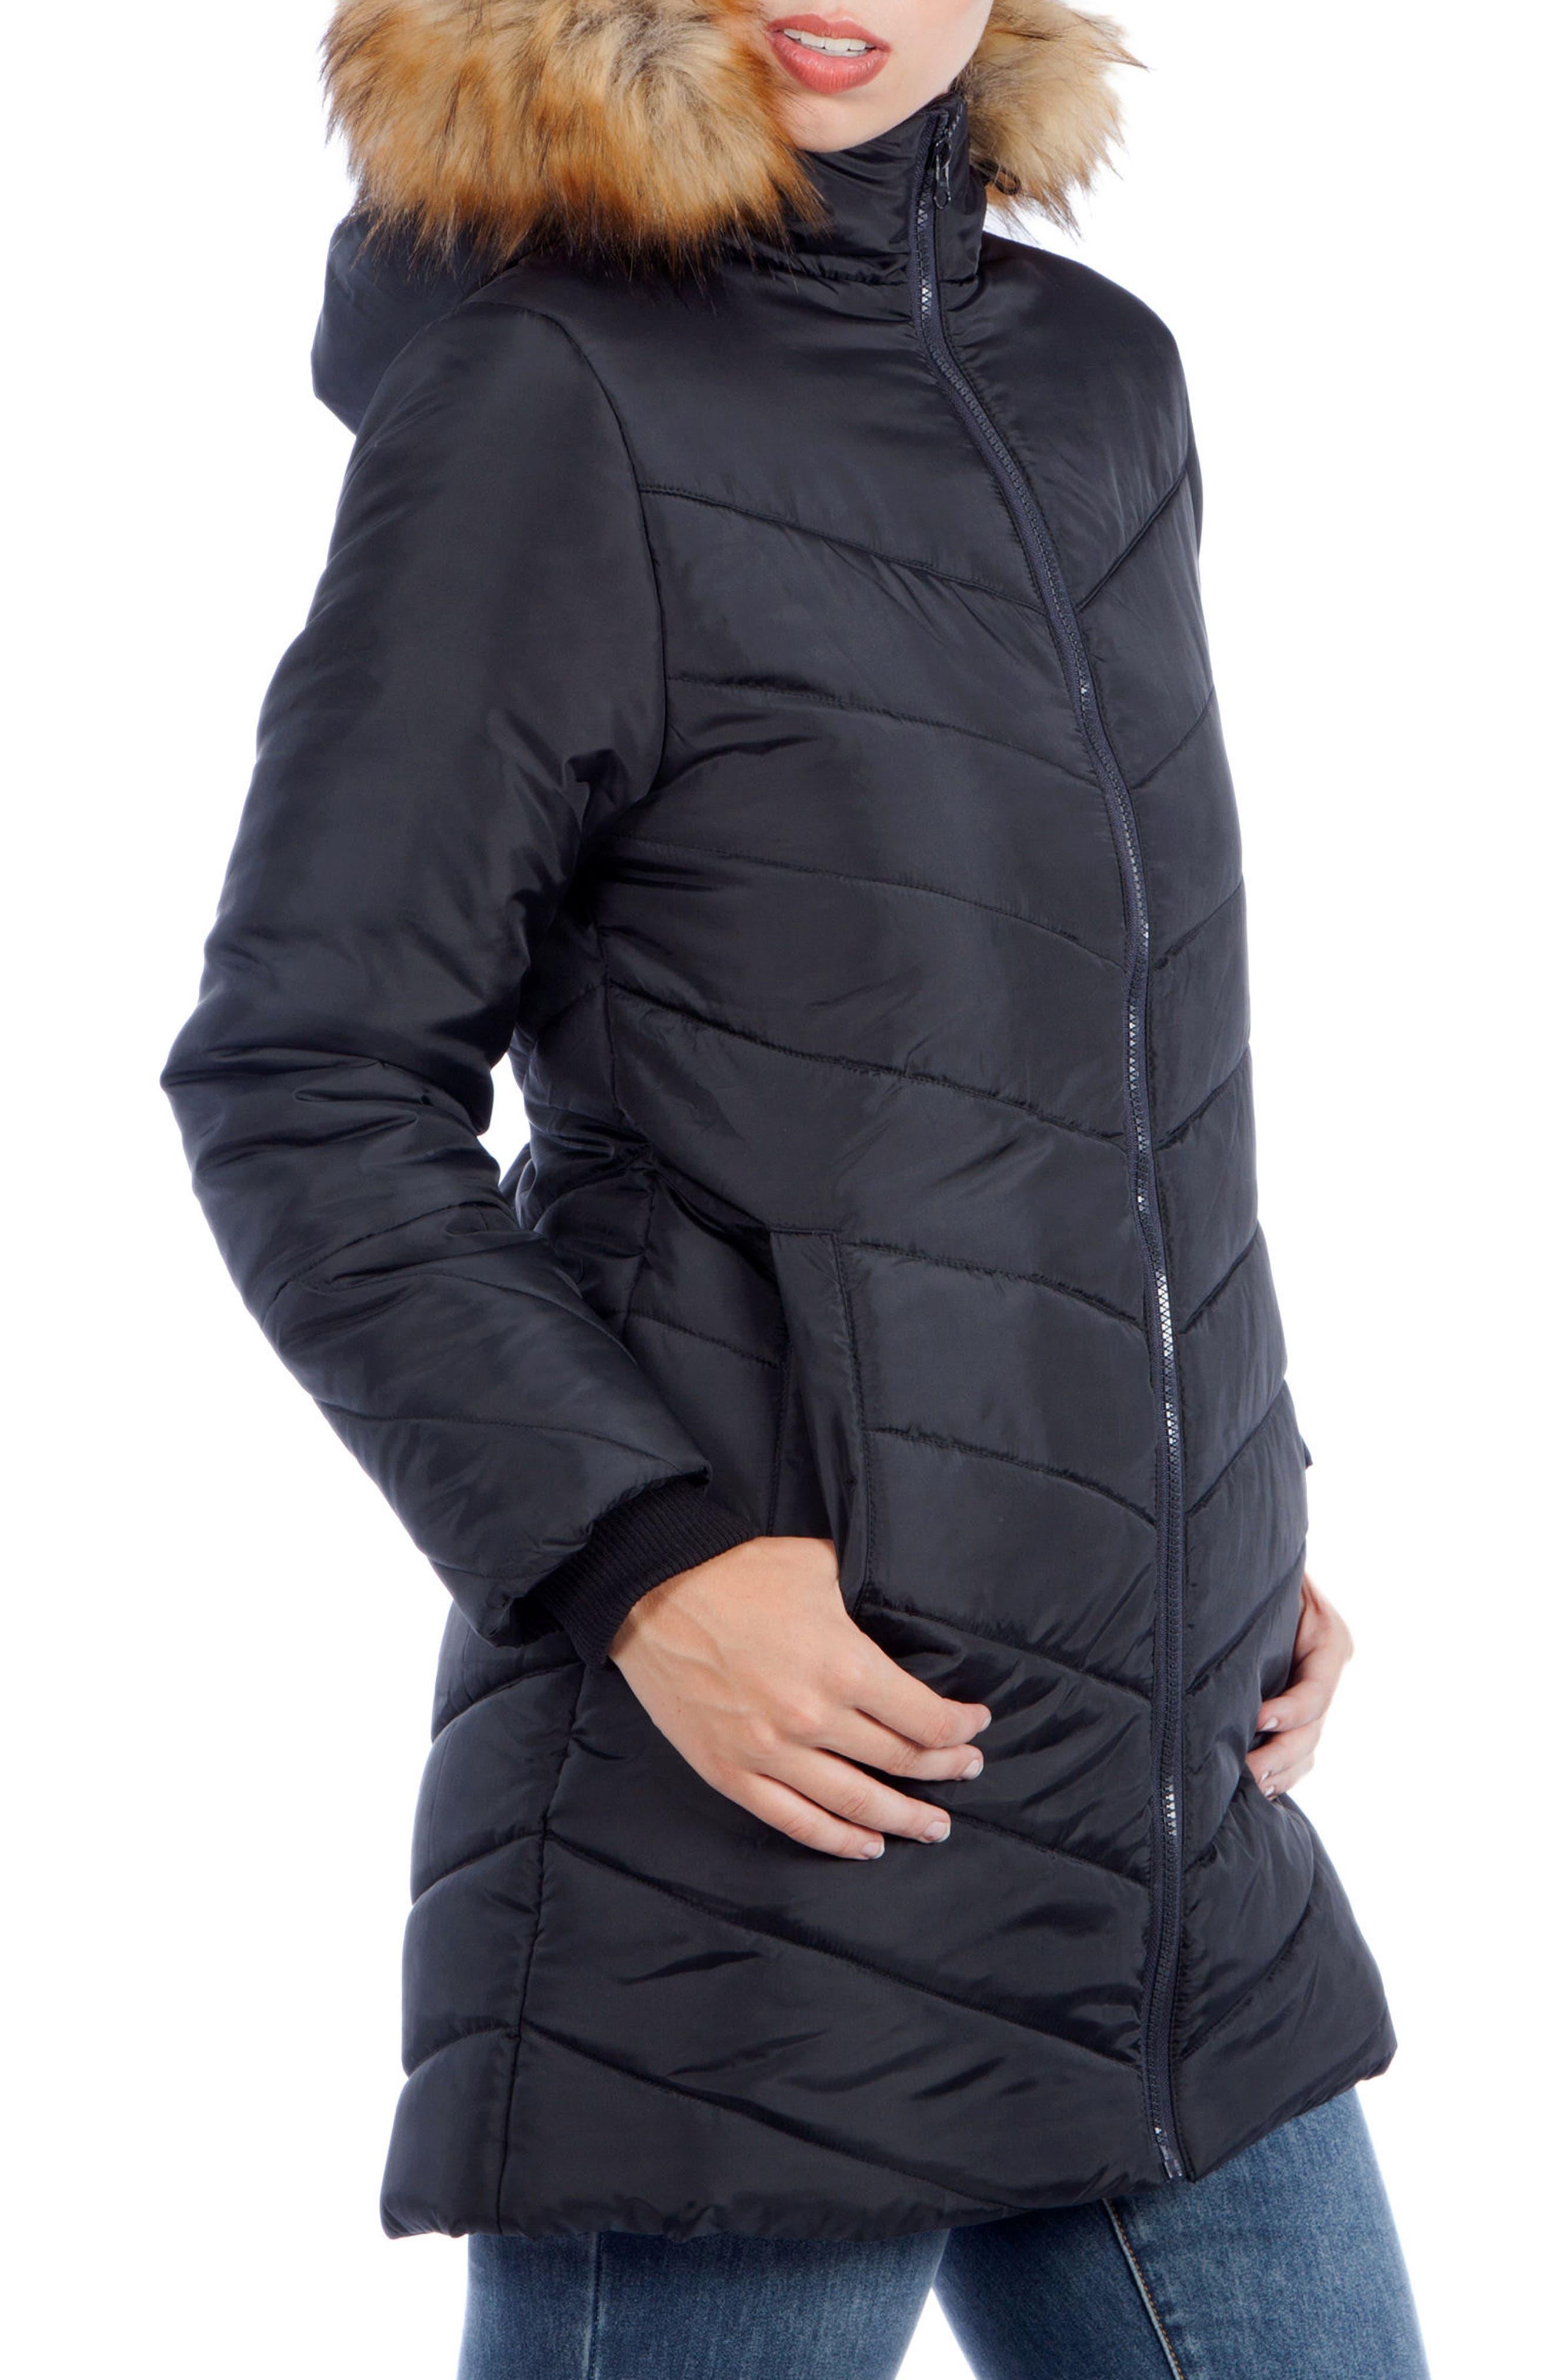 MODERN ETERNITY, Faux Fur Trim Convertible Puffer 3-in-1 Maternity Jacket, Alternate thumbnail 4, color, BLACK